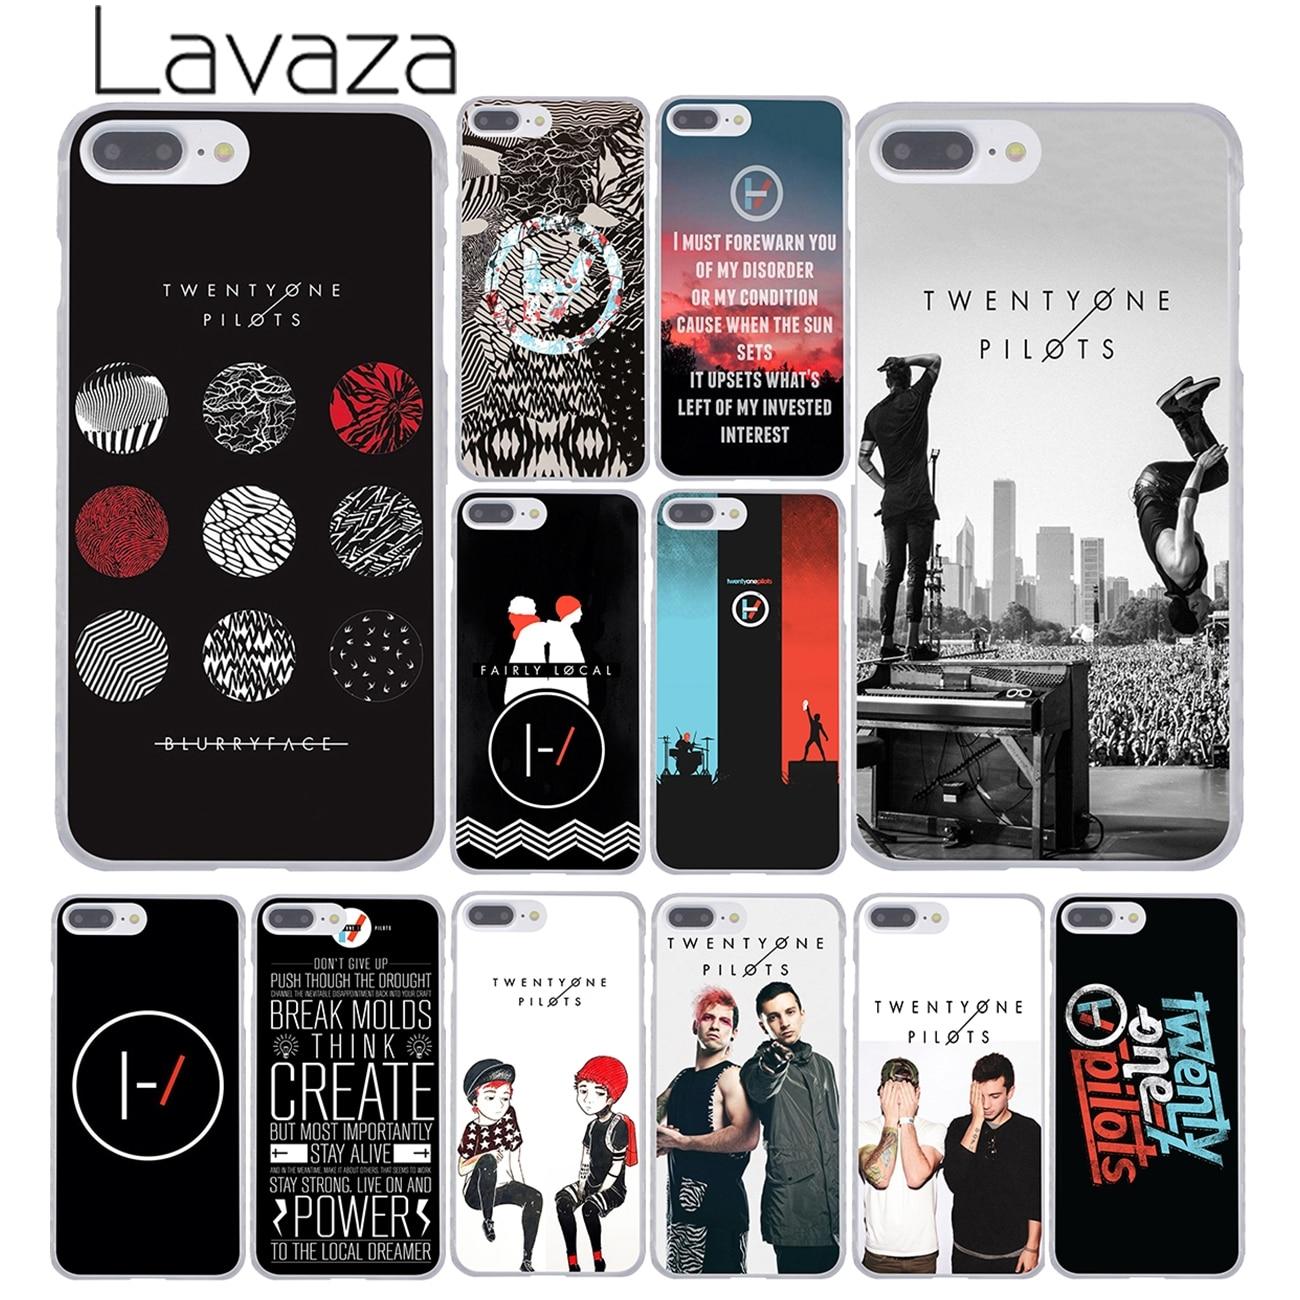 Жесткий чехол для телефона Lavaza Twenty One пилотов 21, для iPhone XR, XS, X, 11 Pro, Max, 10, 7, 8, 6, 6 S, 5, 5S, SE, 4